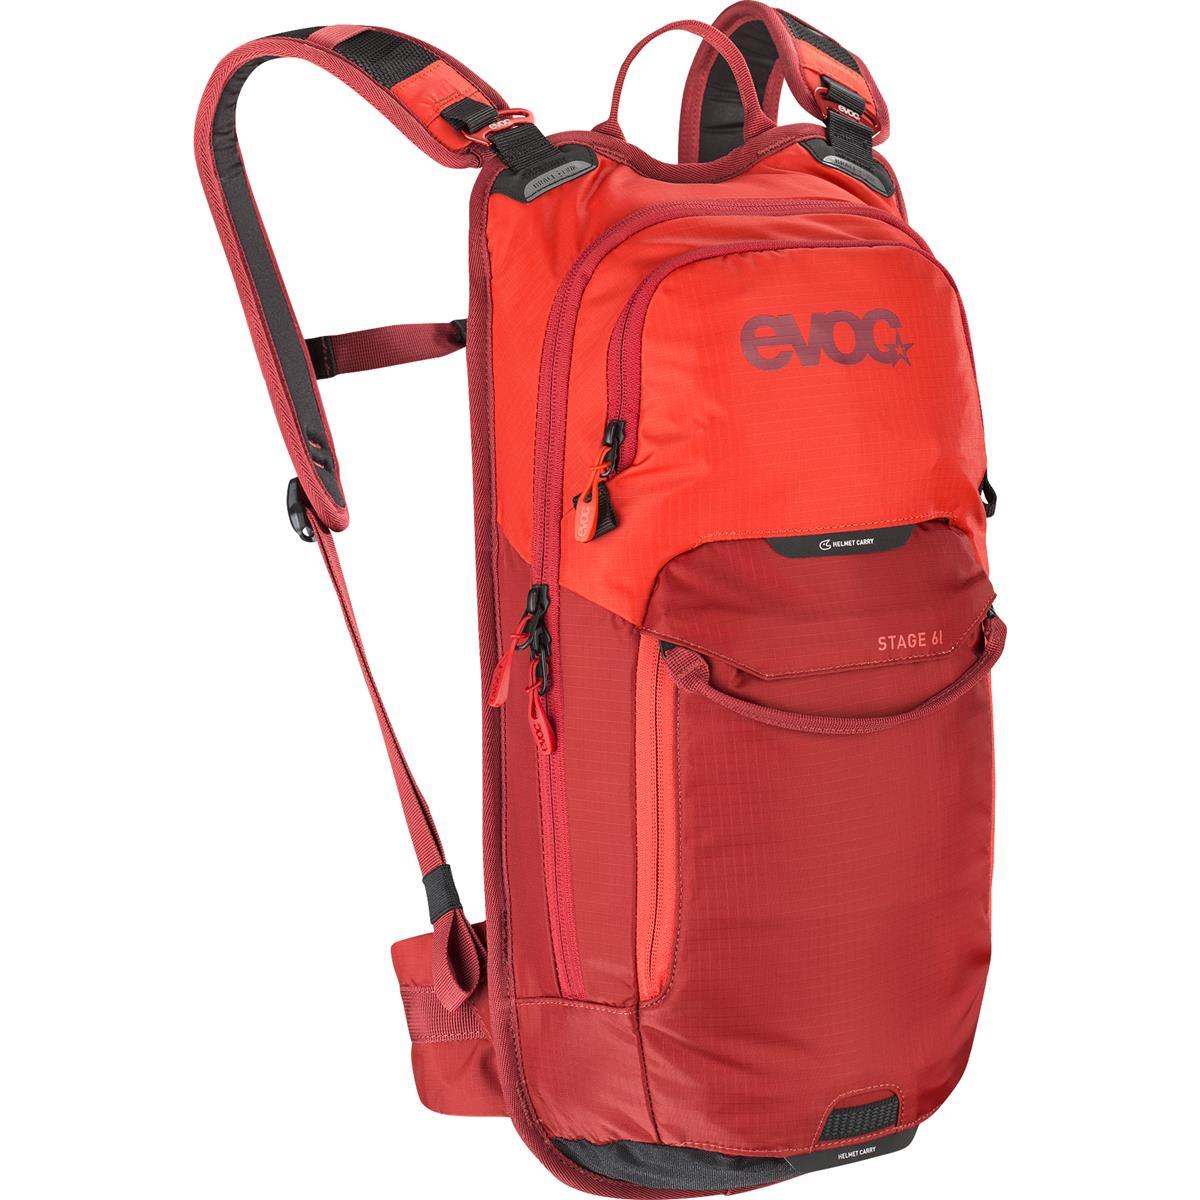 Evoc Rucksack mit Trinksystem Stage Orange/Chili Red, 6 Liter